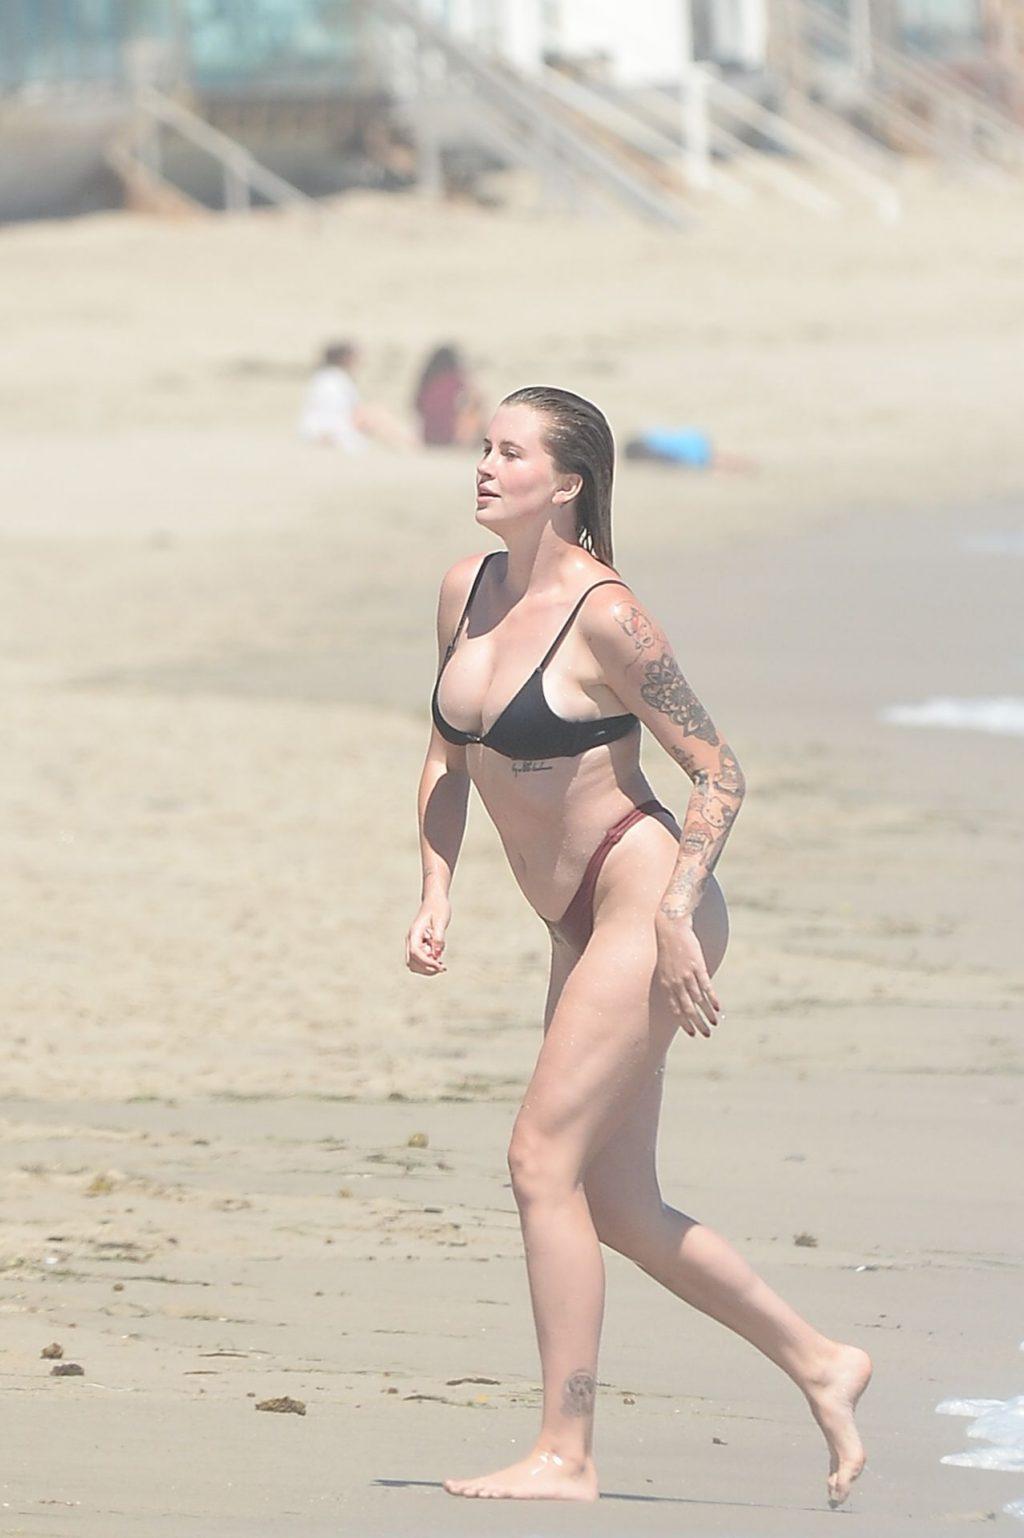 Busty Ireland Baldwin Heads to the Beach in Malibu with Friends (89 Photos)